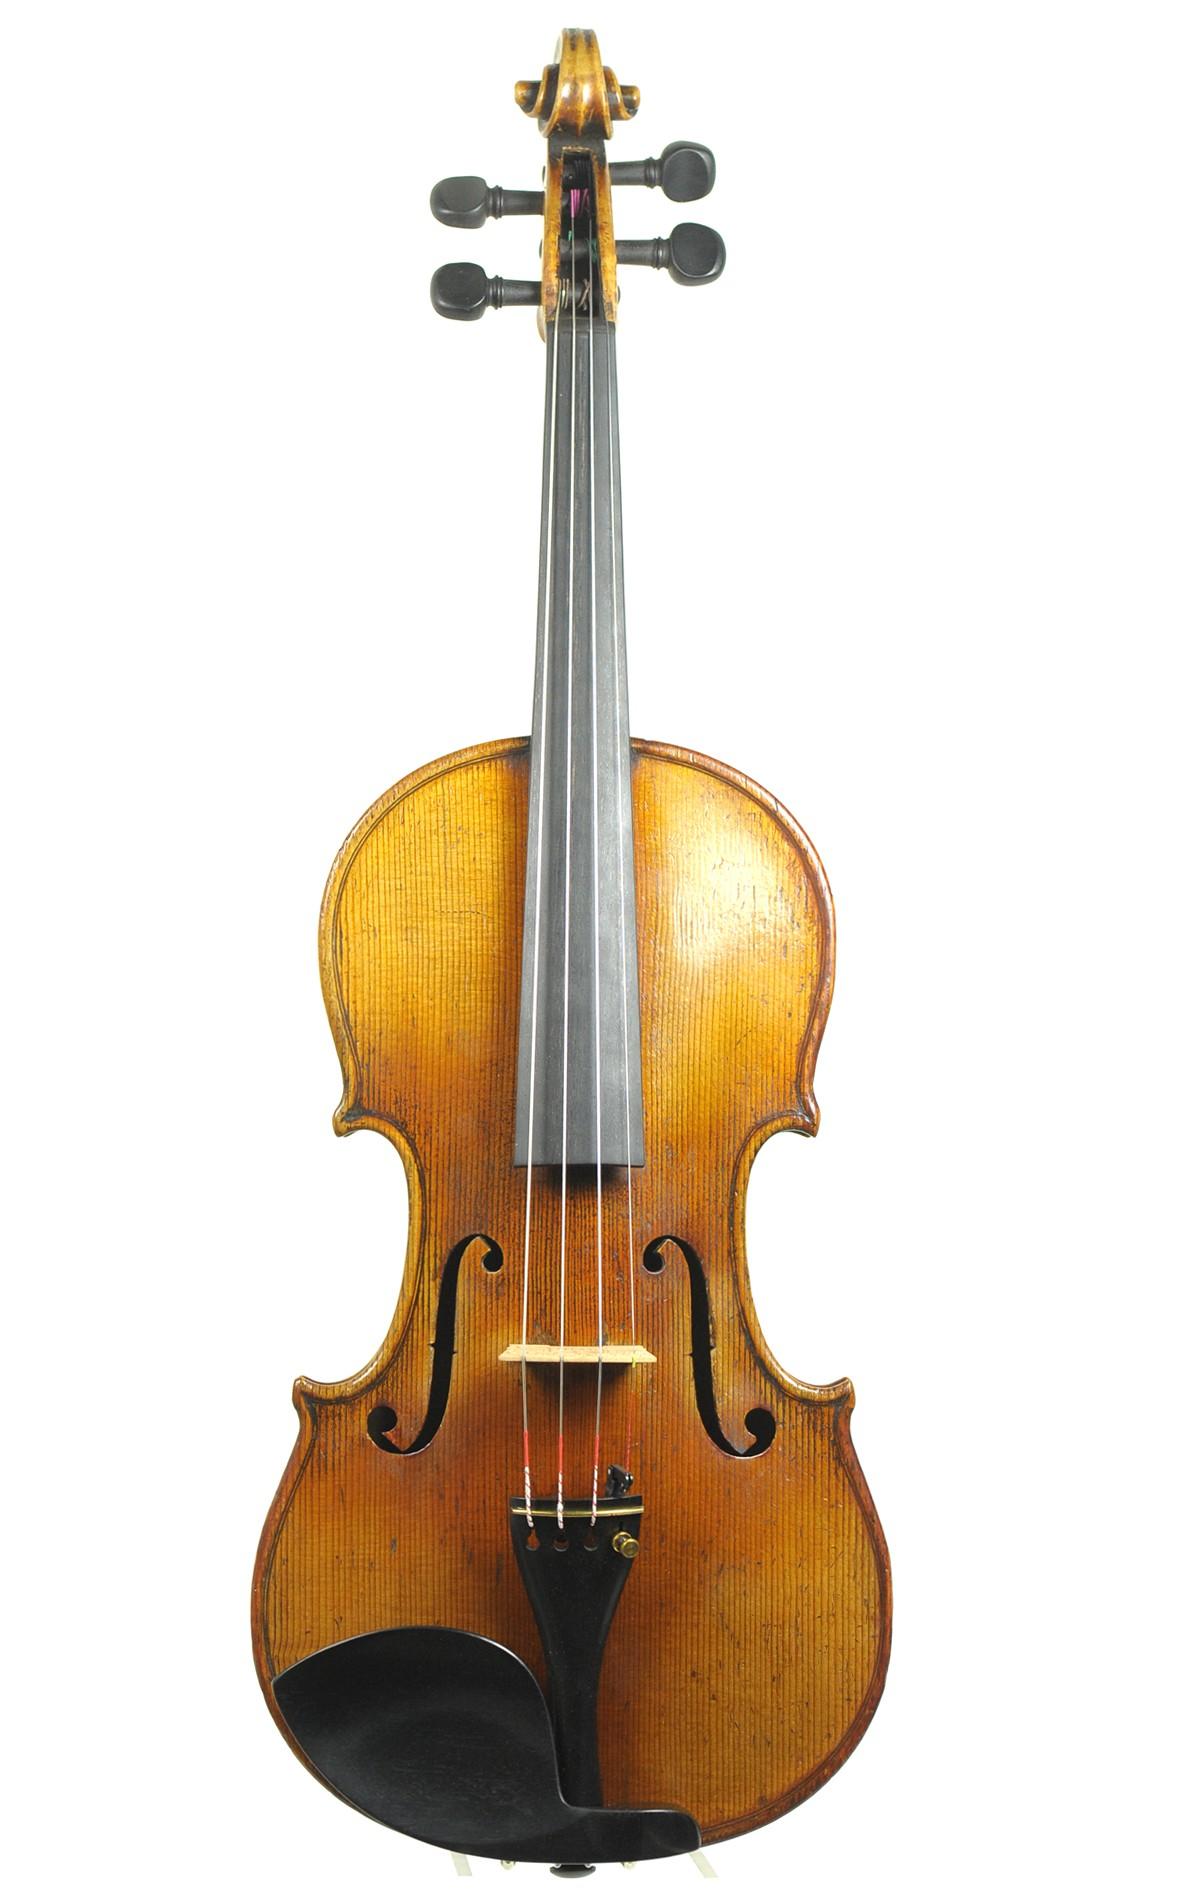 Antique German Markneukirchen violin of quality, after Stradivari